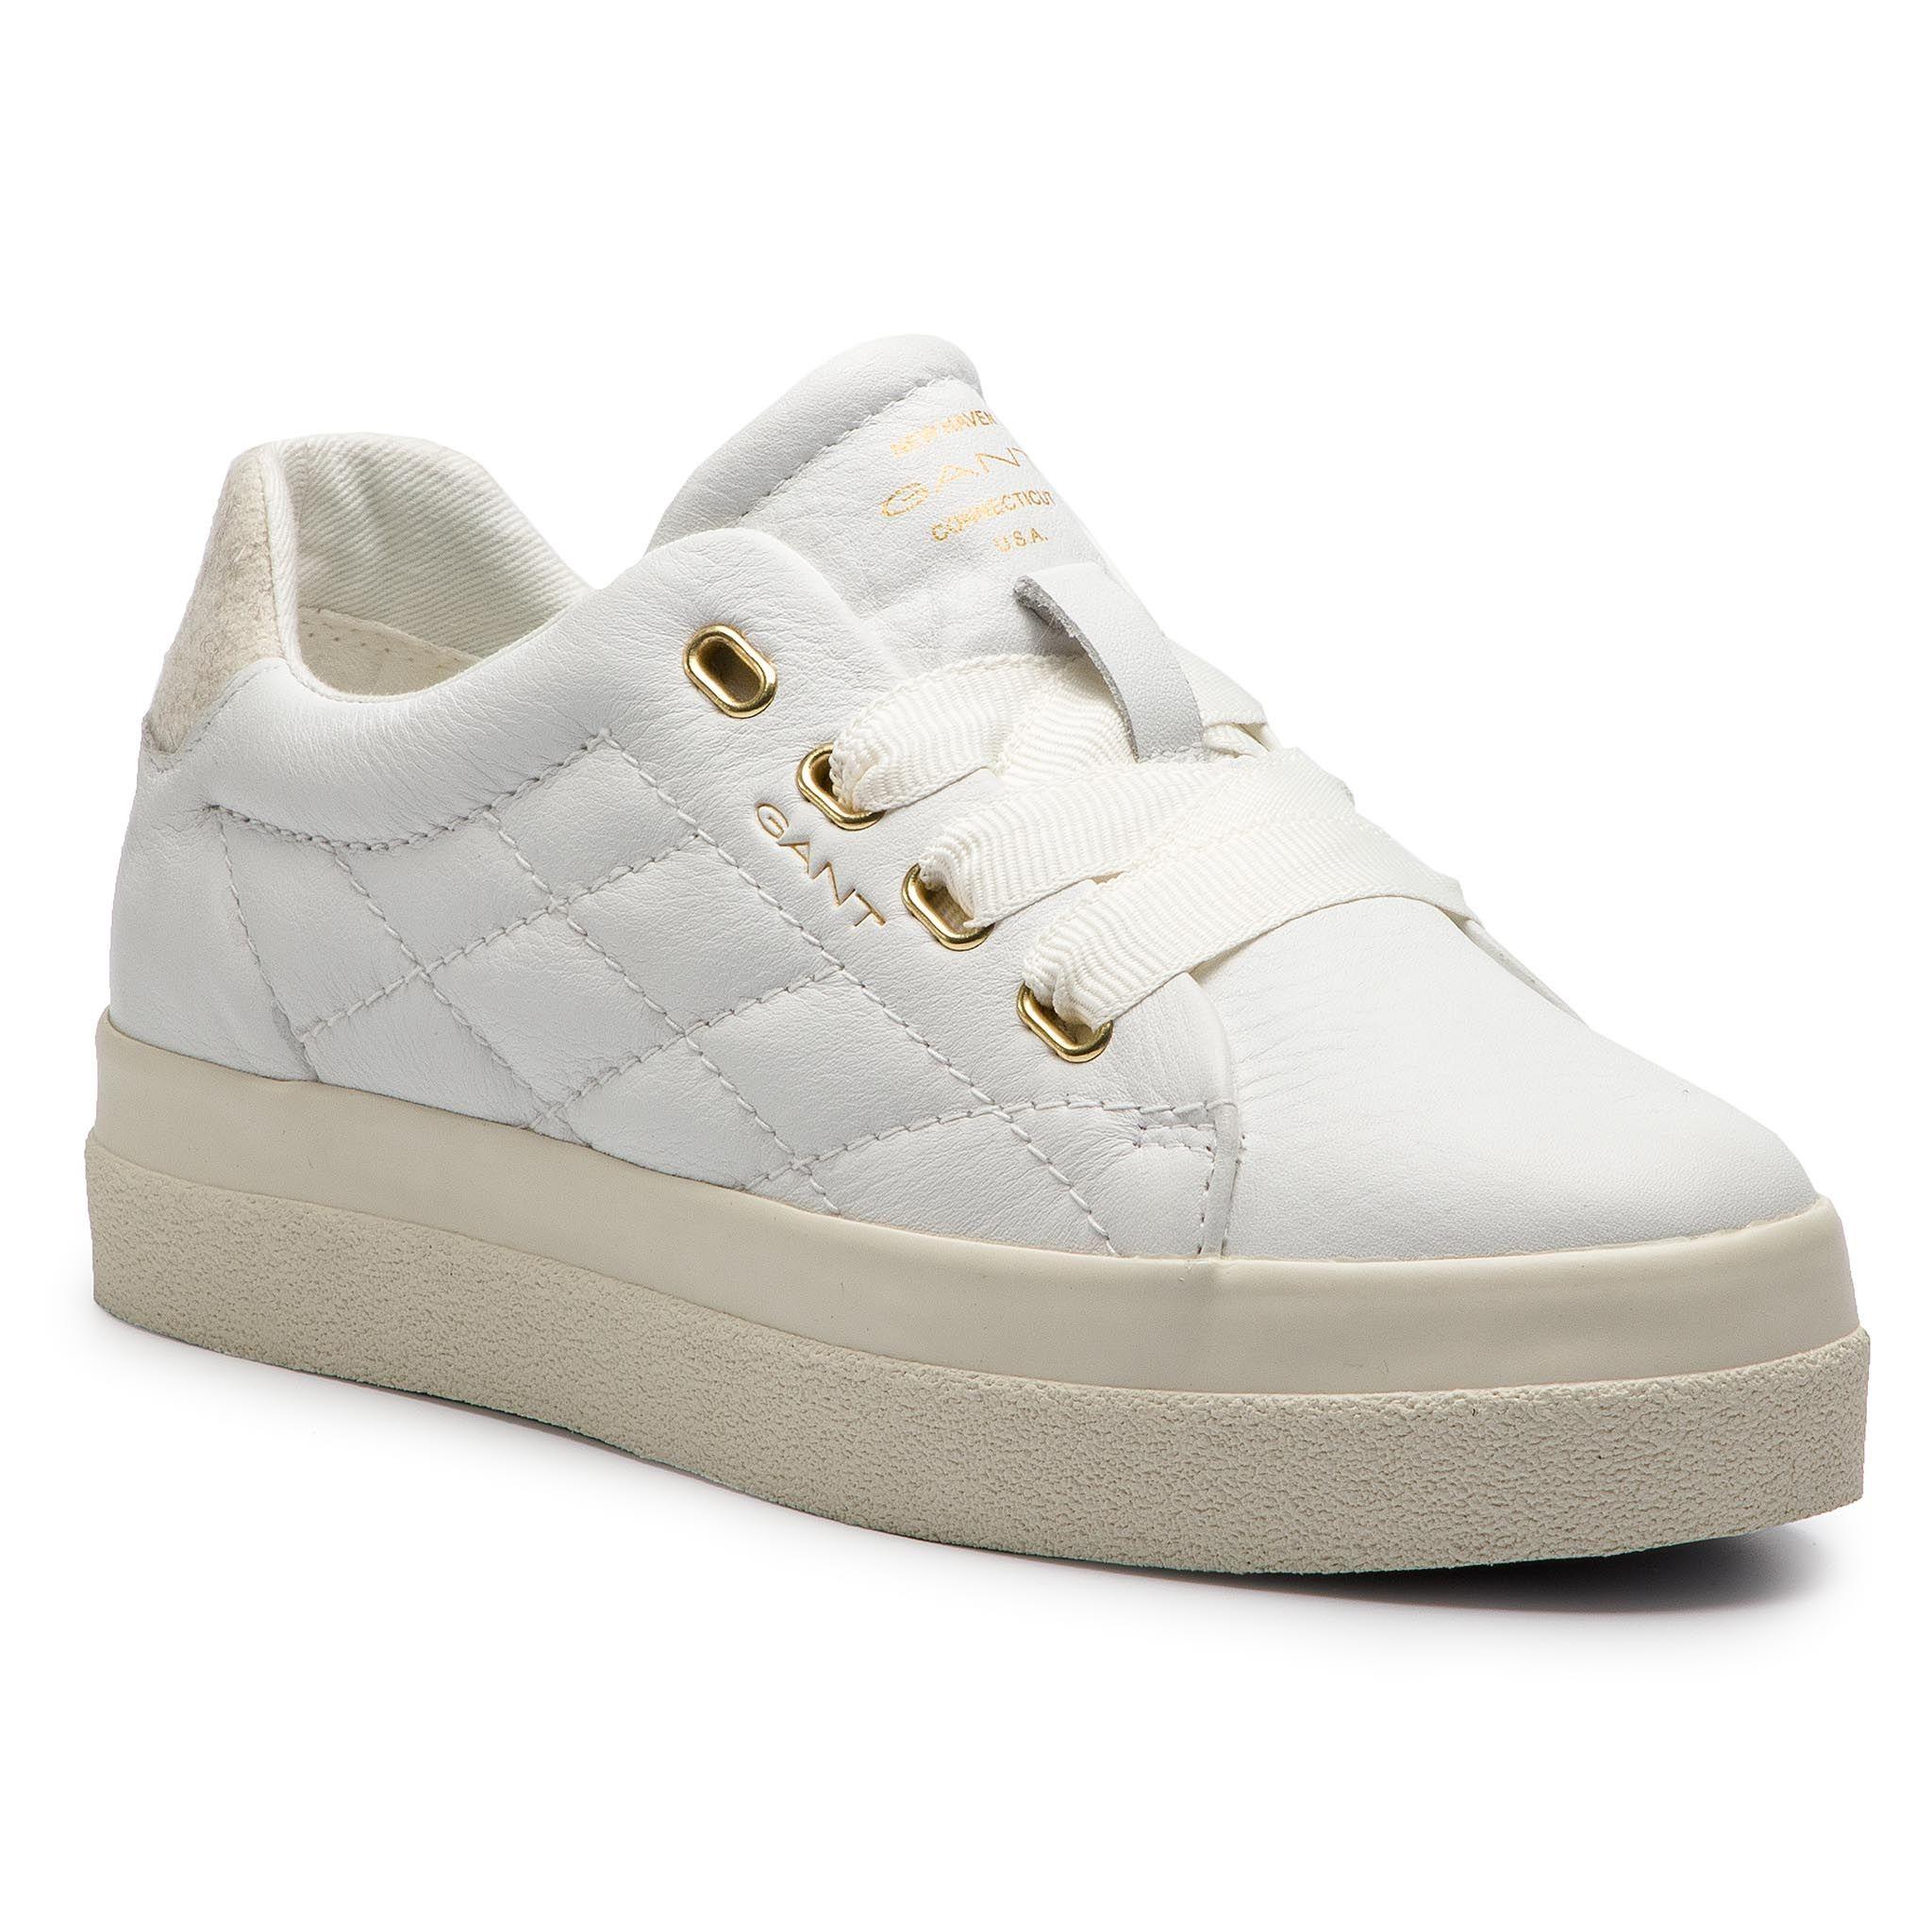 4a50b4028b21 Sneakers GEOX - D Gendry A D745TA 01222 C1002 Off White